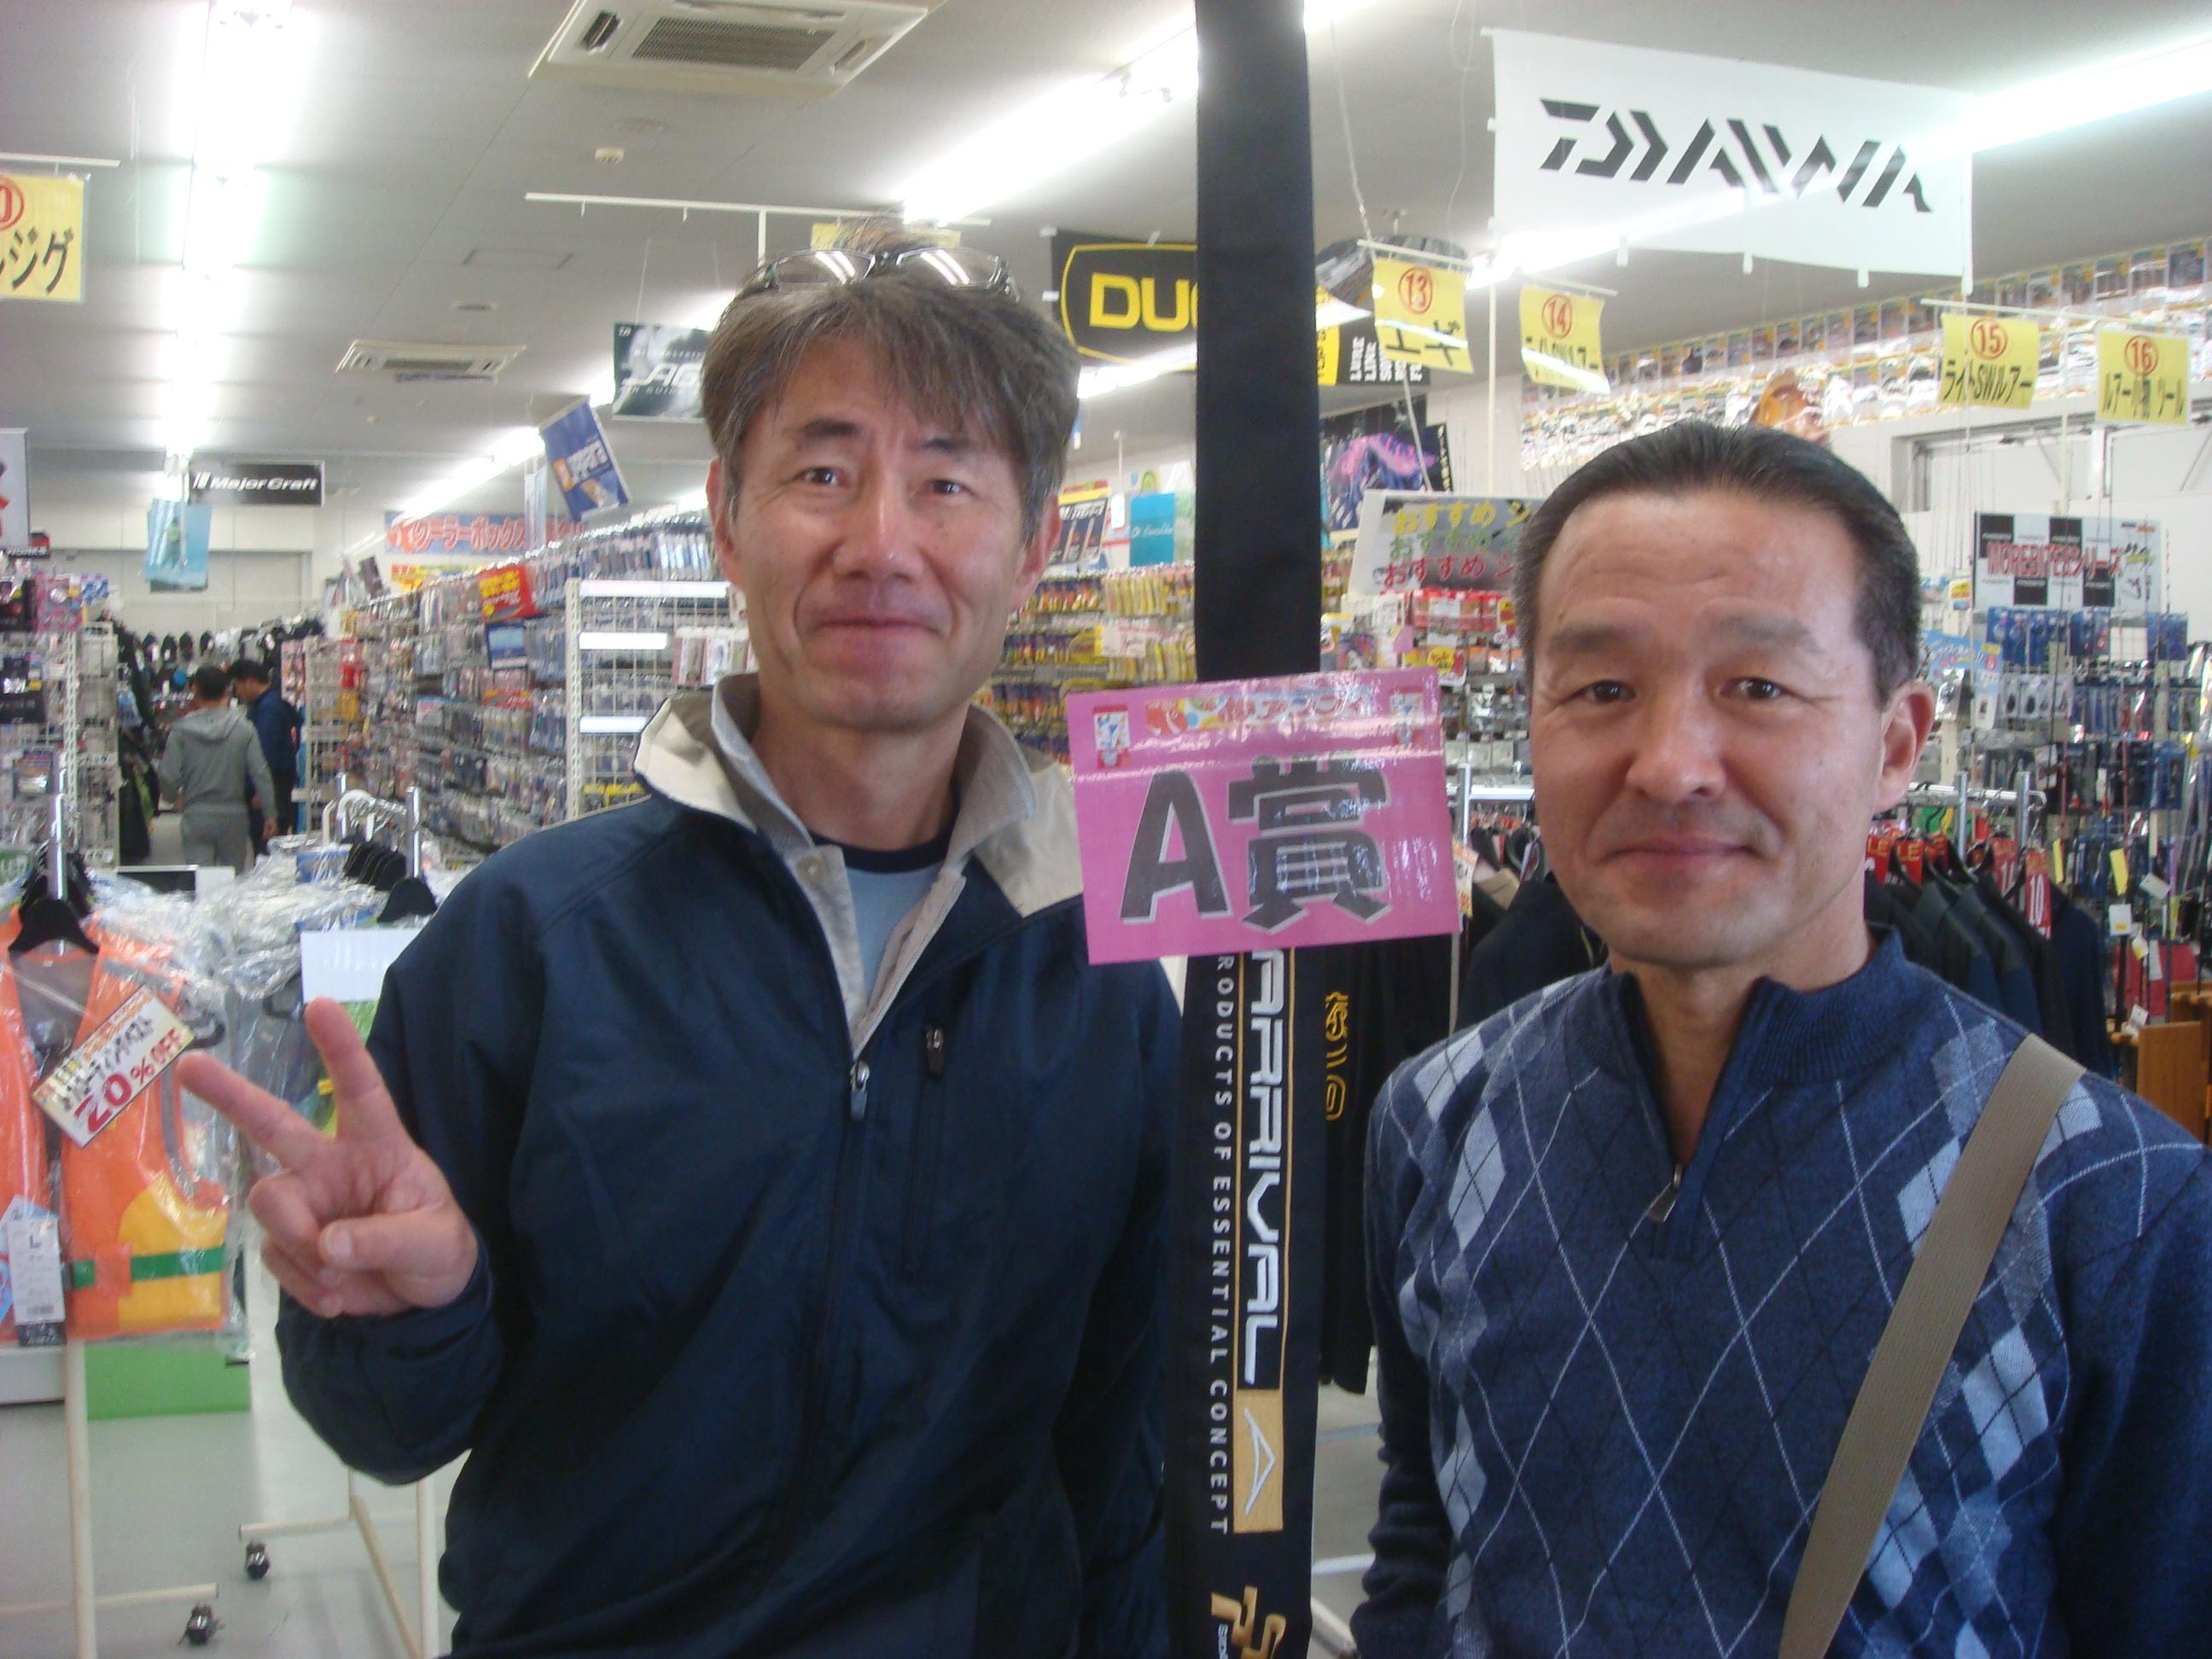 http://www.e-angle.co.jp/shop/news/DSC02974.JPG